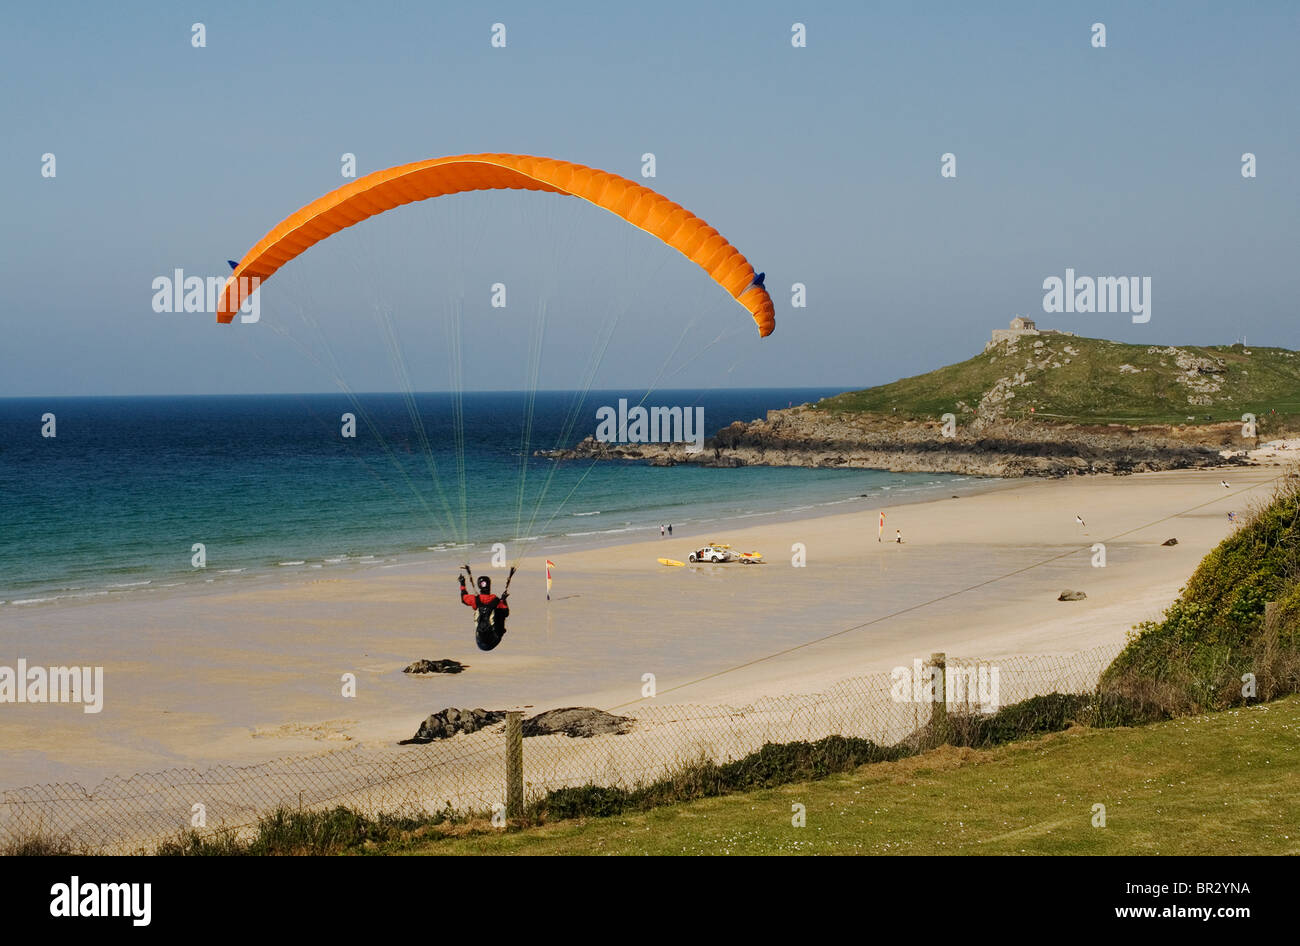 Colorful Hang Glider Flying Over Porthmeor Beach, Saint Ives, Cornwall. Stock Photo